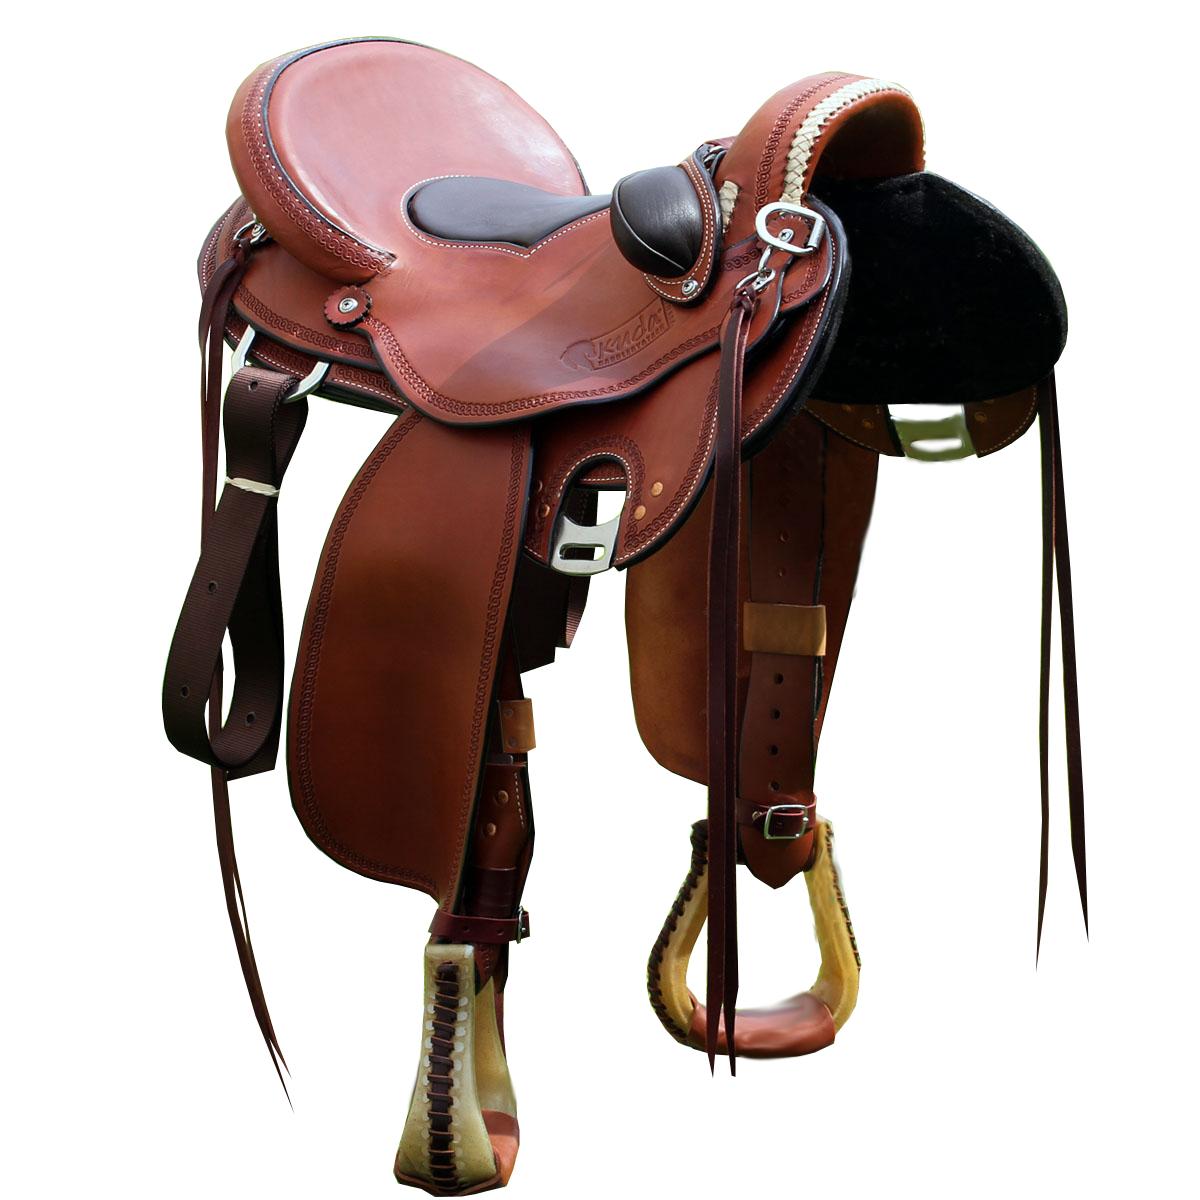 Kuda Elite Flex with padded inset seat